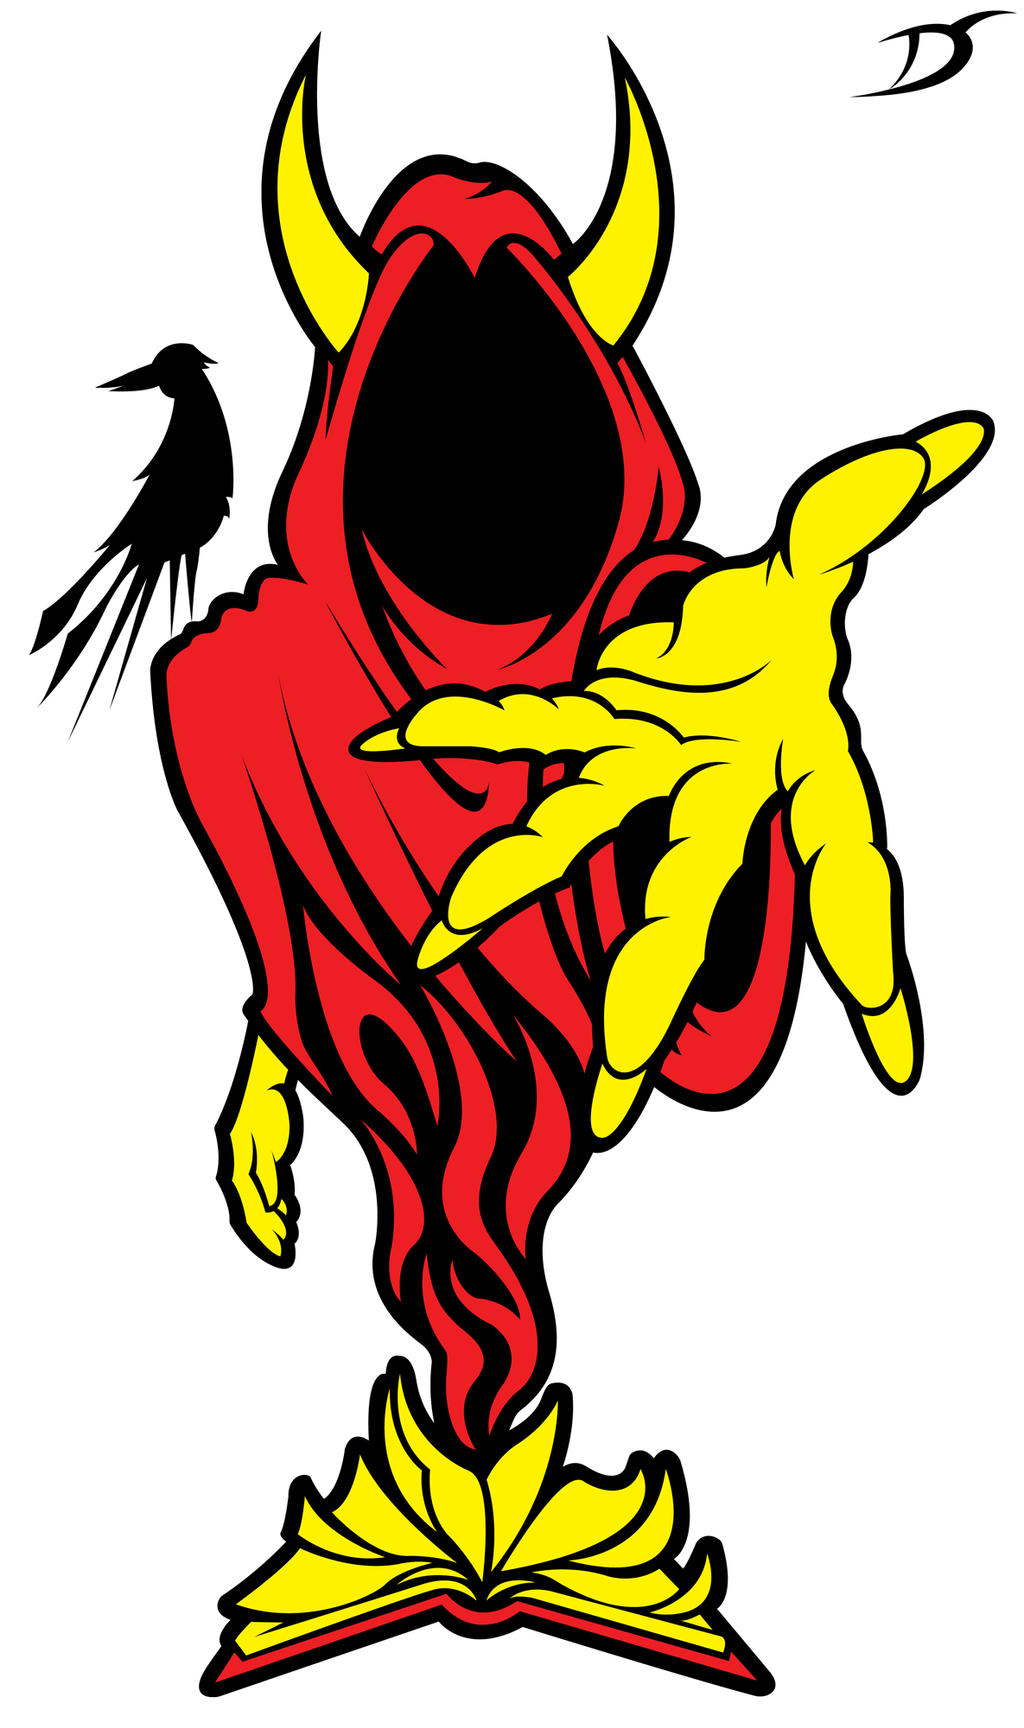 Displaying 17 gt  Images For - Insane Clown Posse Hatchet Man Logo   Icp Joker Card Drawings